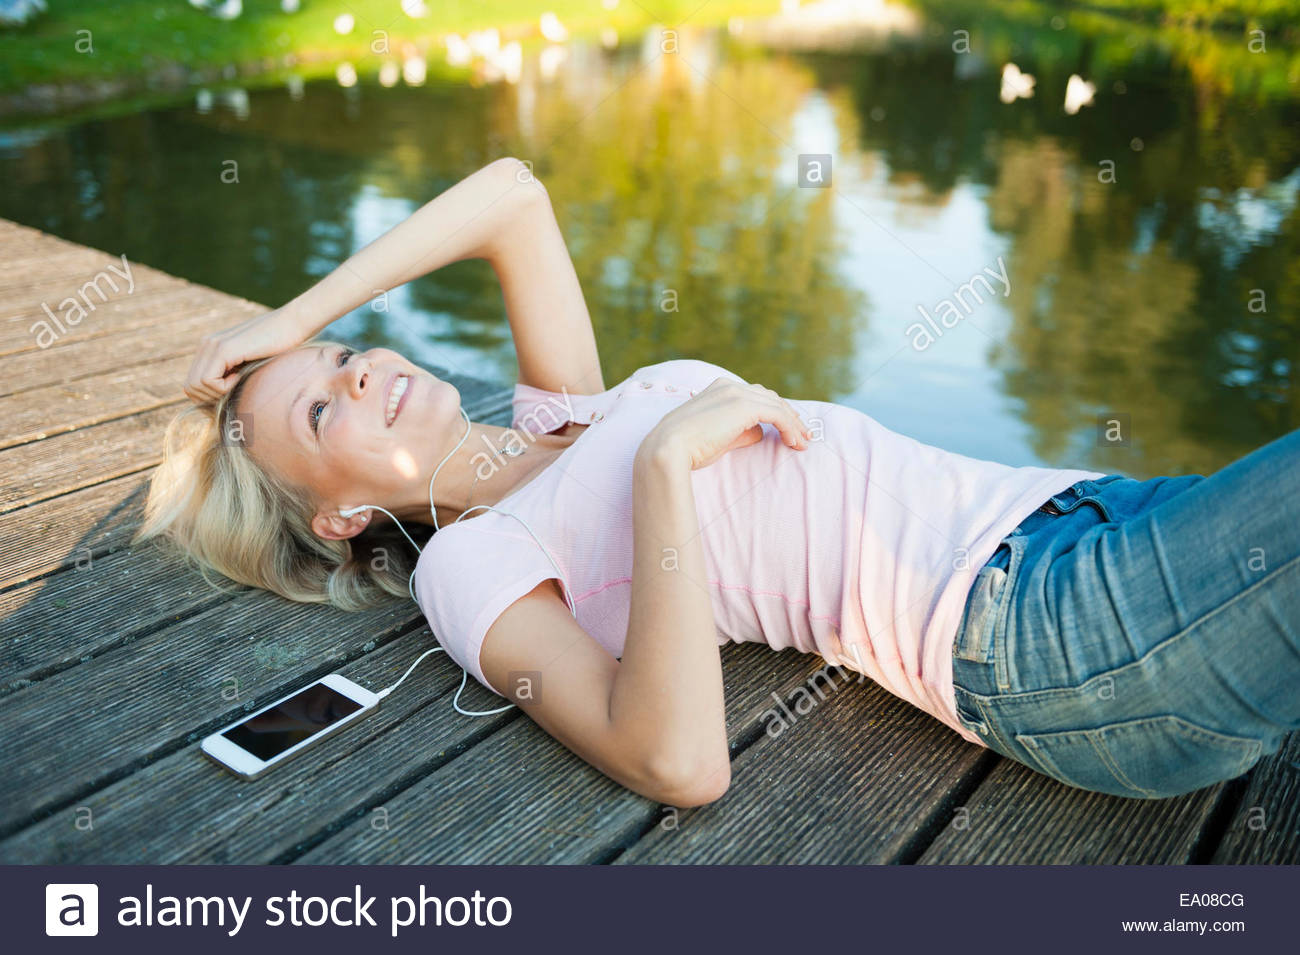 Junge Frau liegt am Pier mit MP3-player Stockbild